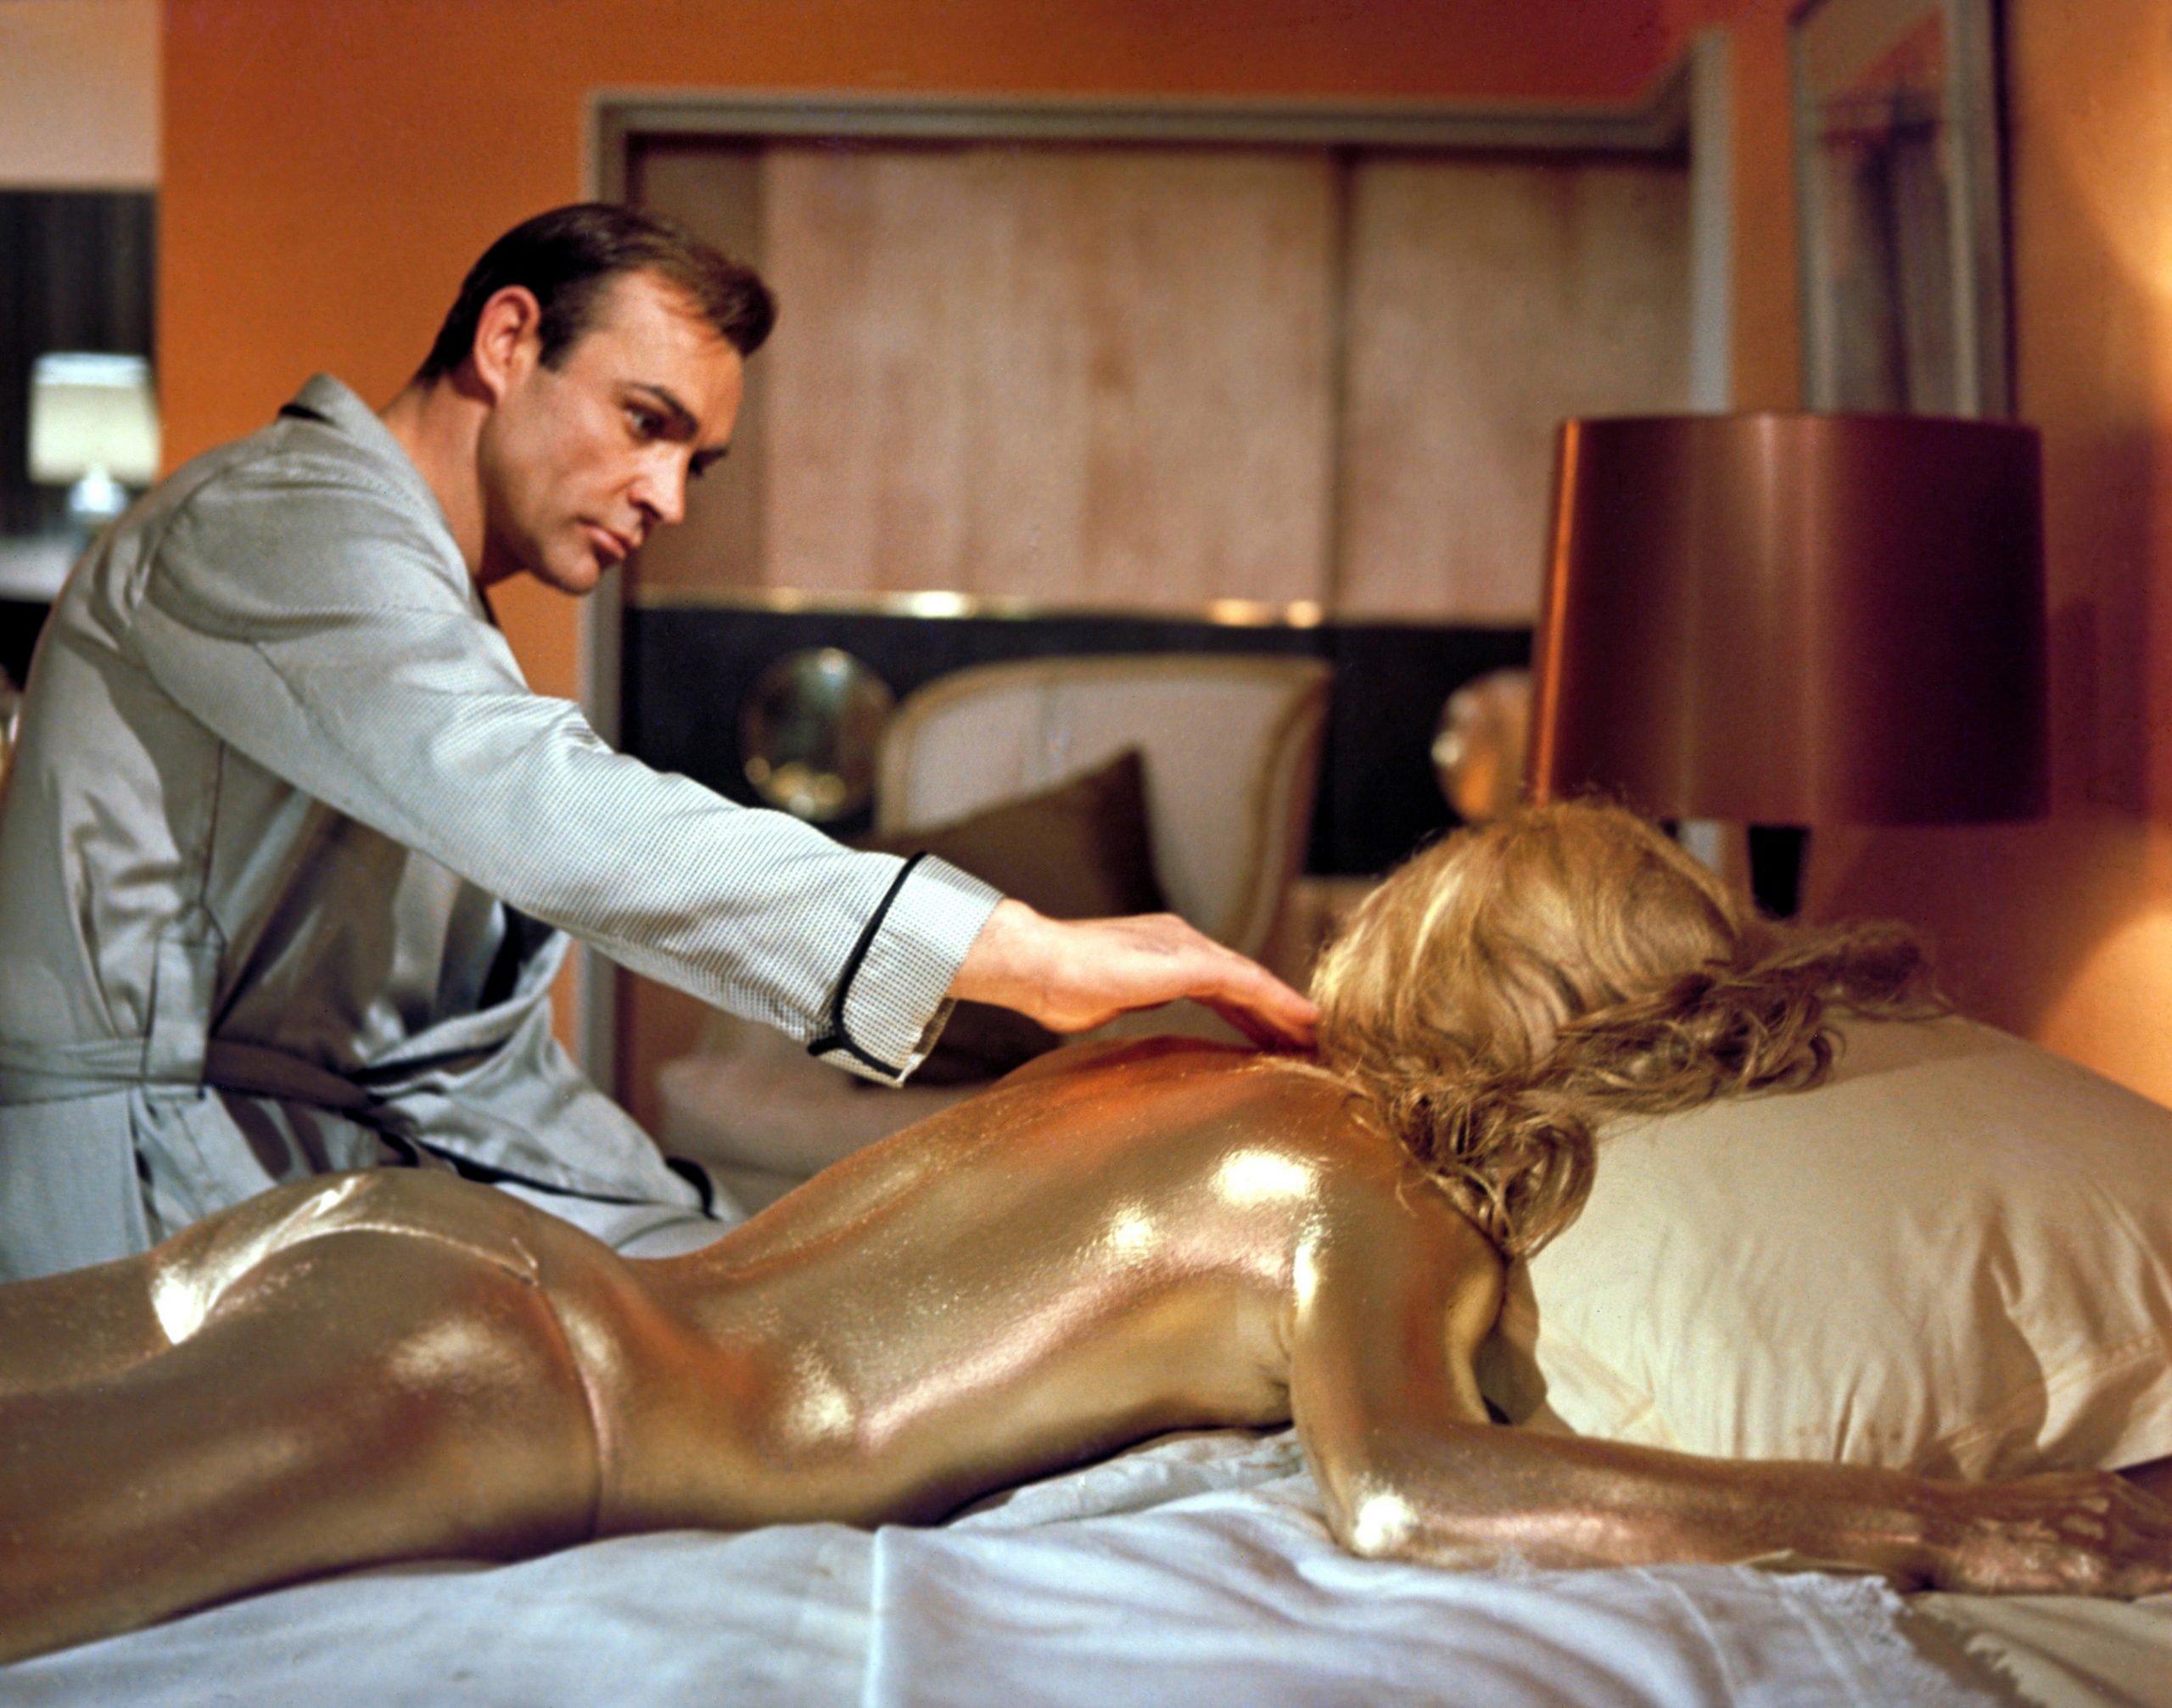 sean-conner-shirley-eaton-in-the-james-bond-film-goldfinger